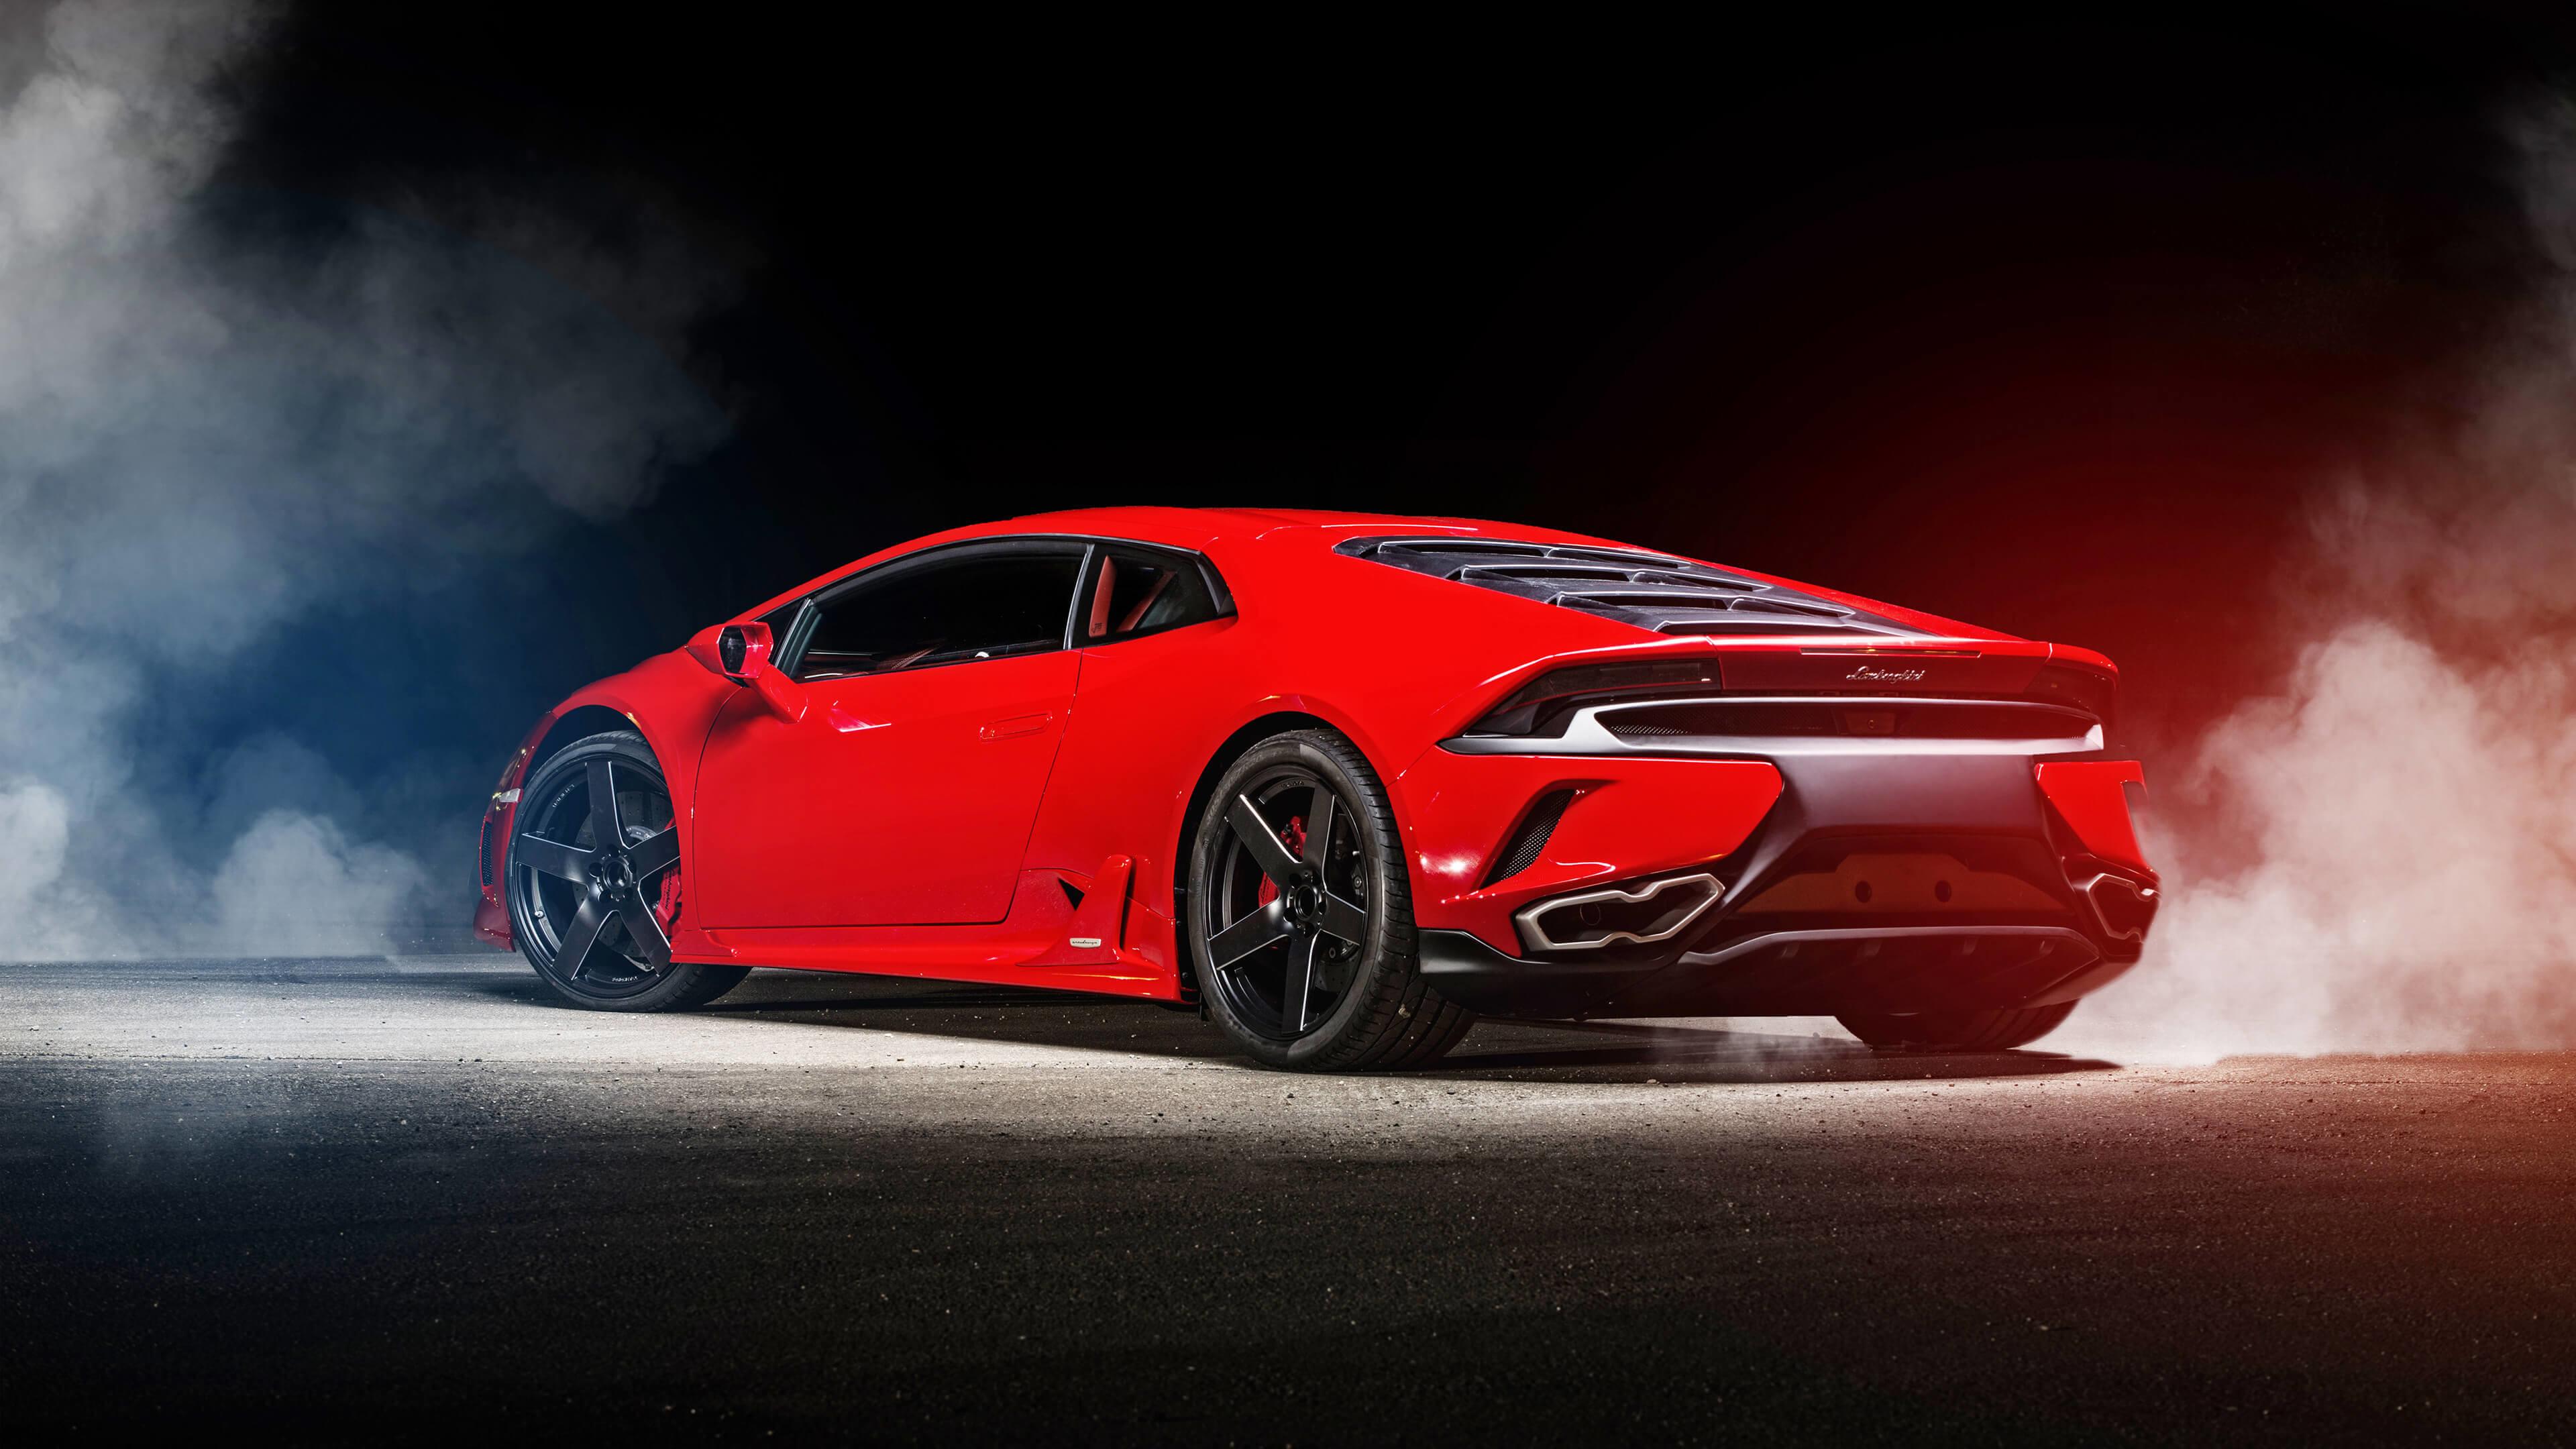 Red Lamborghini Huracan Uhd 4k Wallpaper